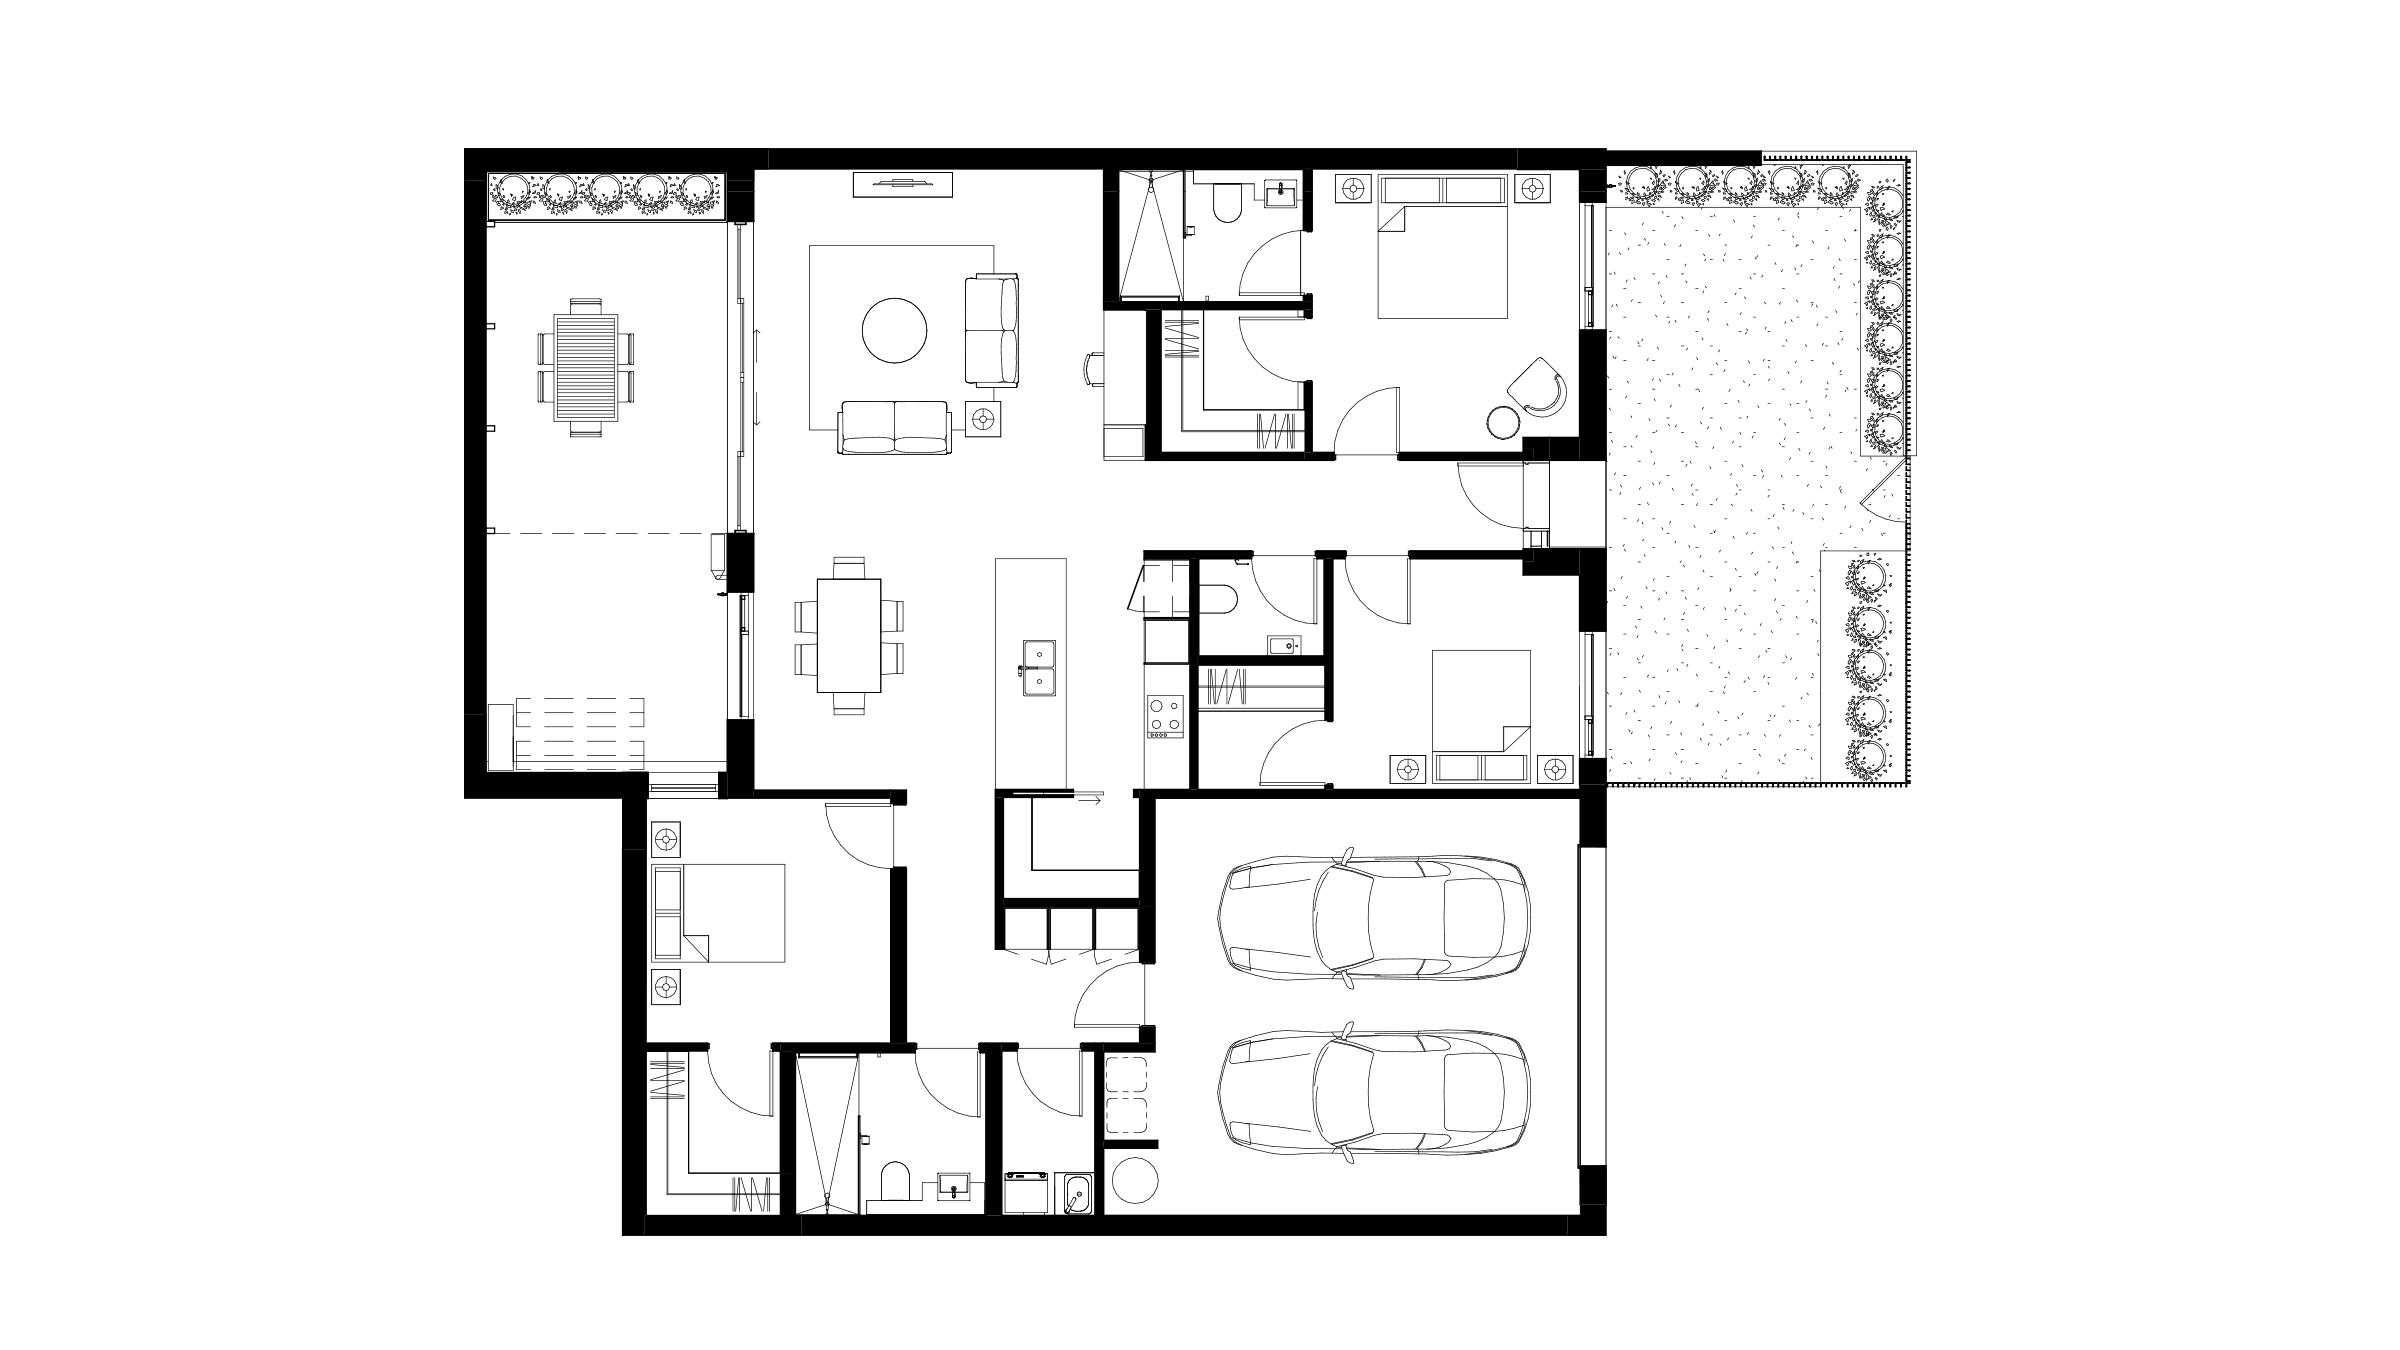 Baptcare, Strathalan (retirement living) - unit 56 floor plan